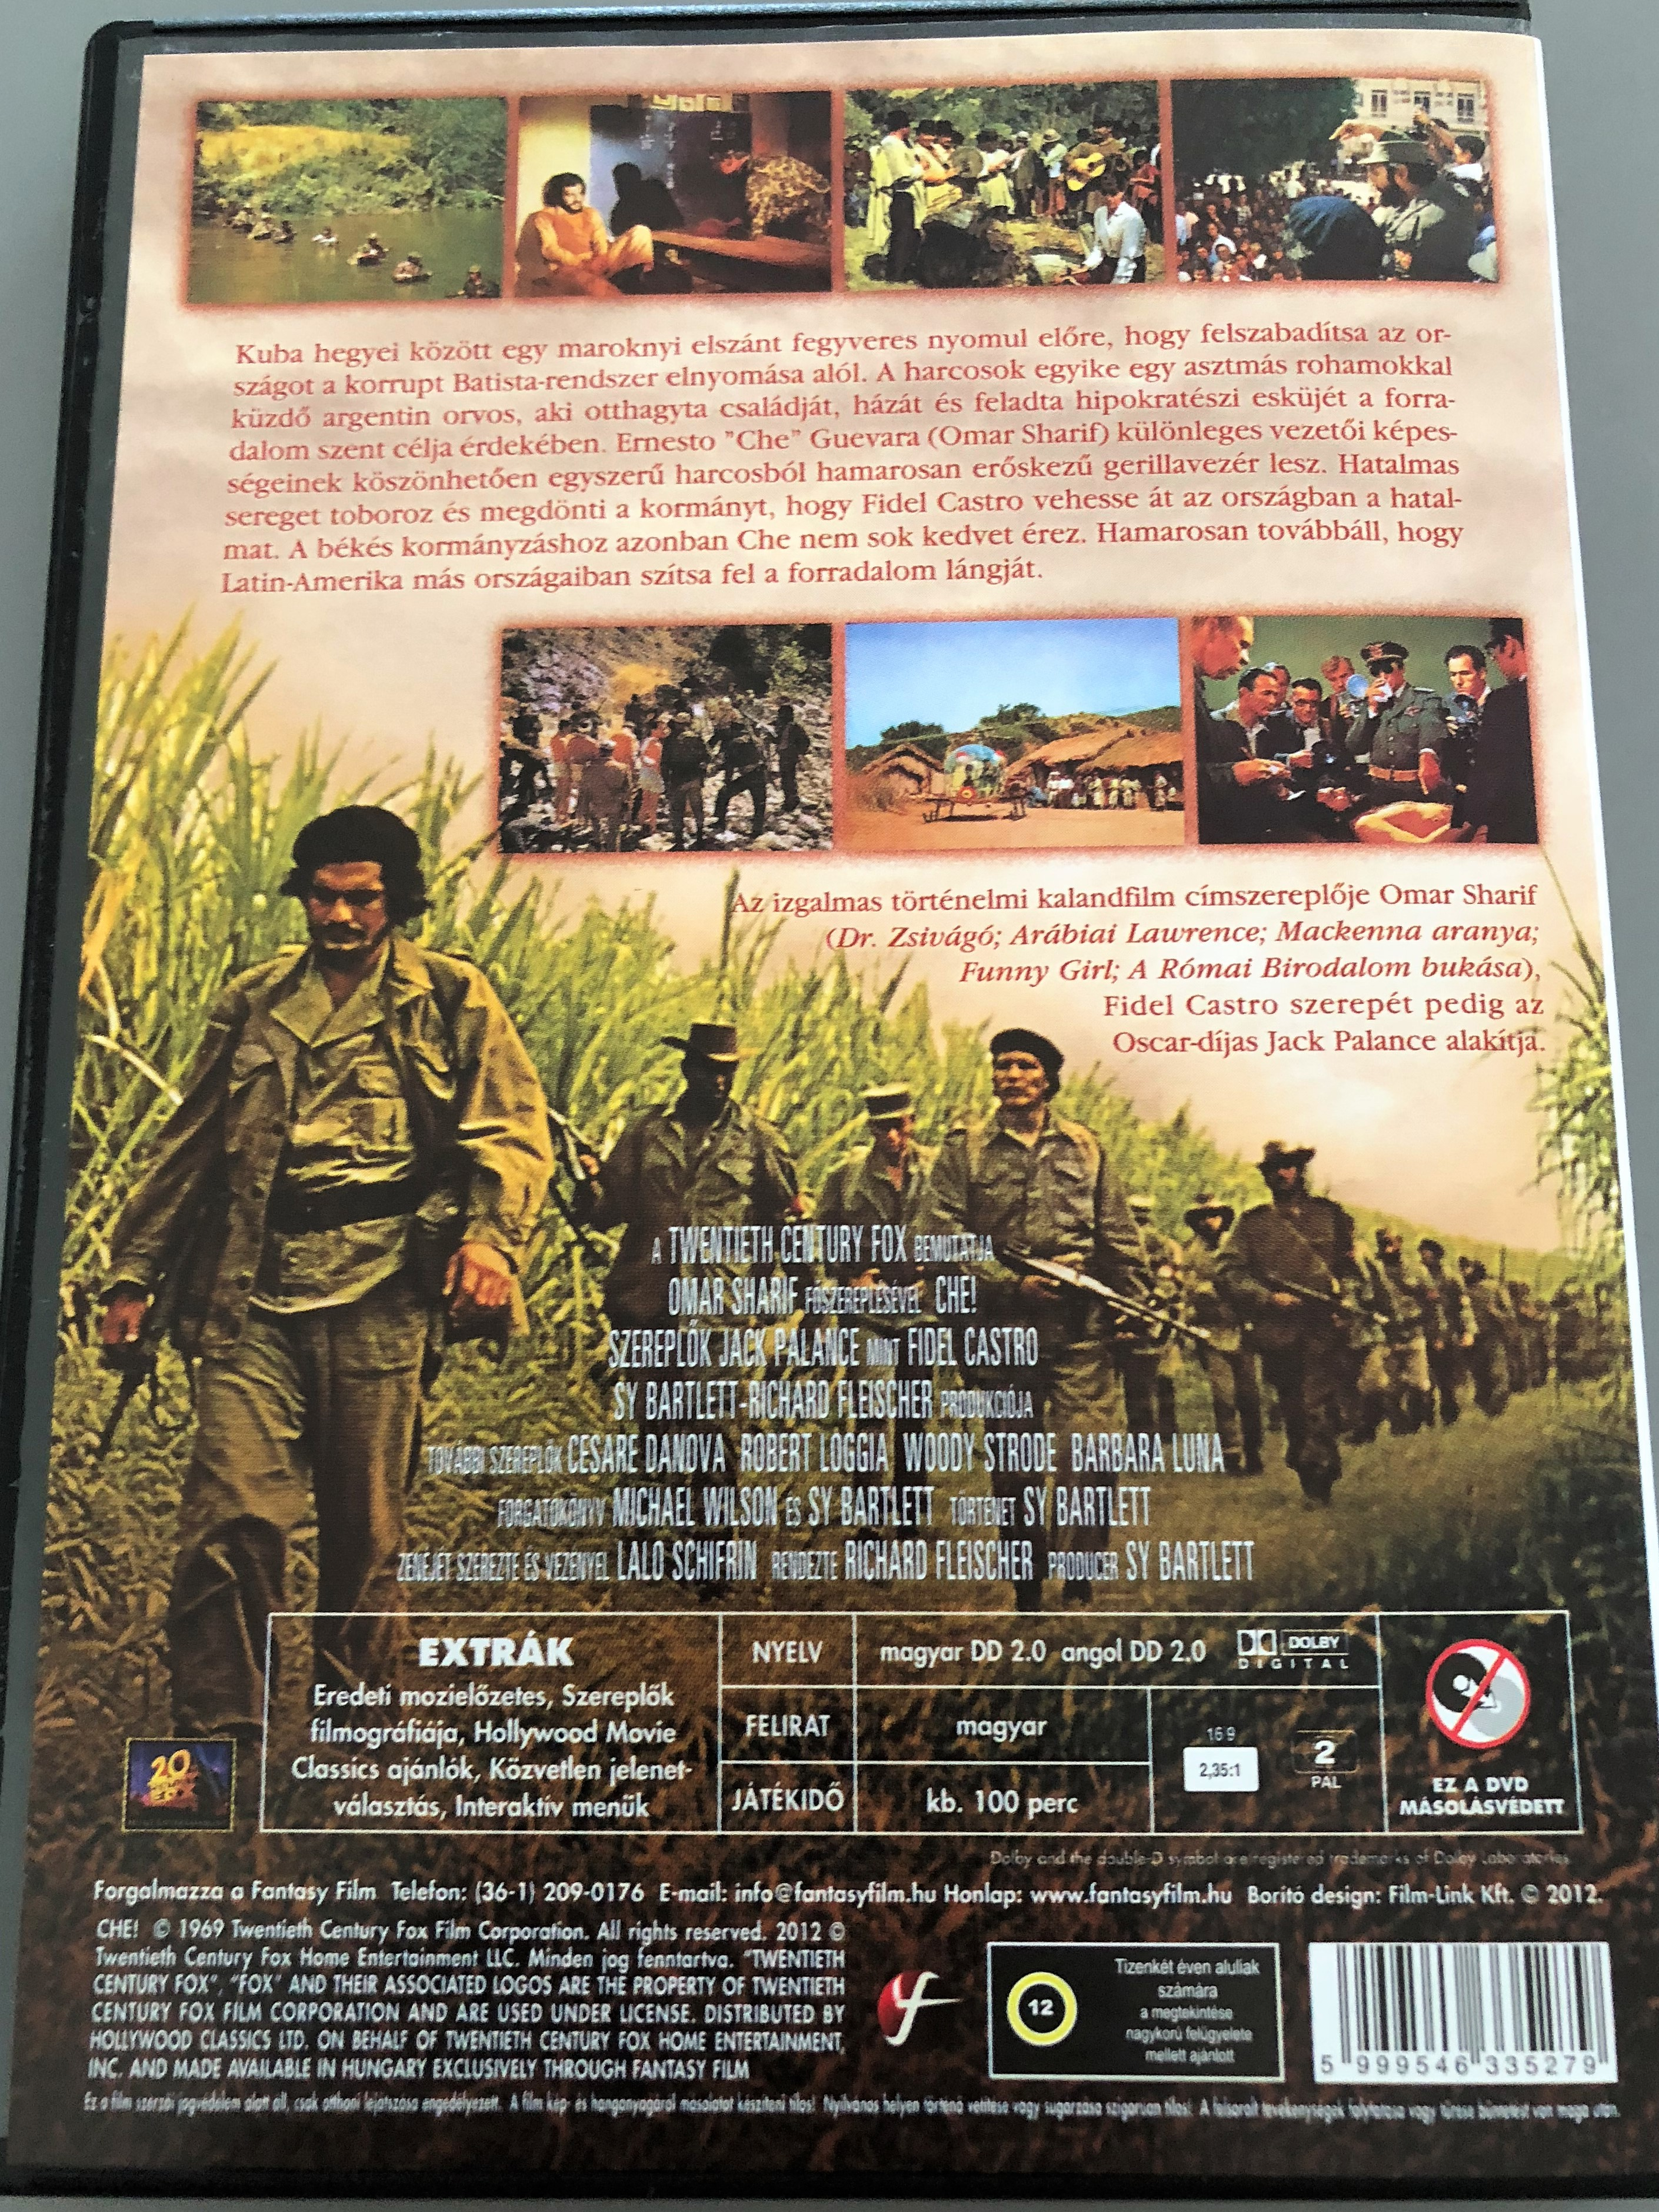 -che-dvd-1969-directed-by-richard-fleischer-starring-omar-sharif-jack-palance-hollywood-movie-classics-gyilkos.-forradalm-r.-legenda-2-.jpg